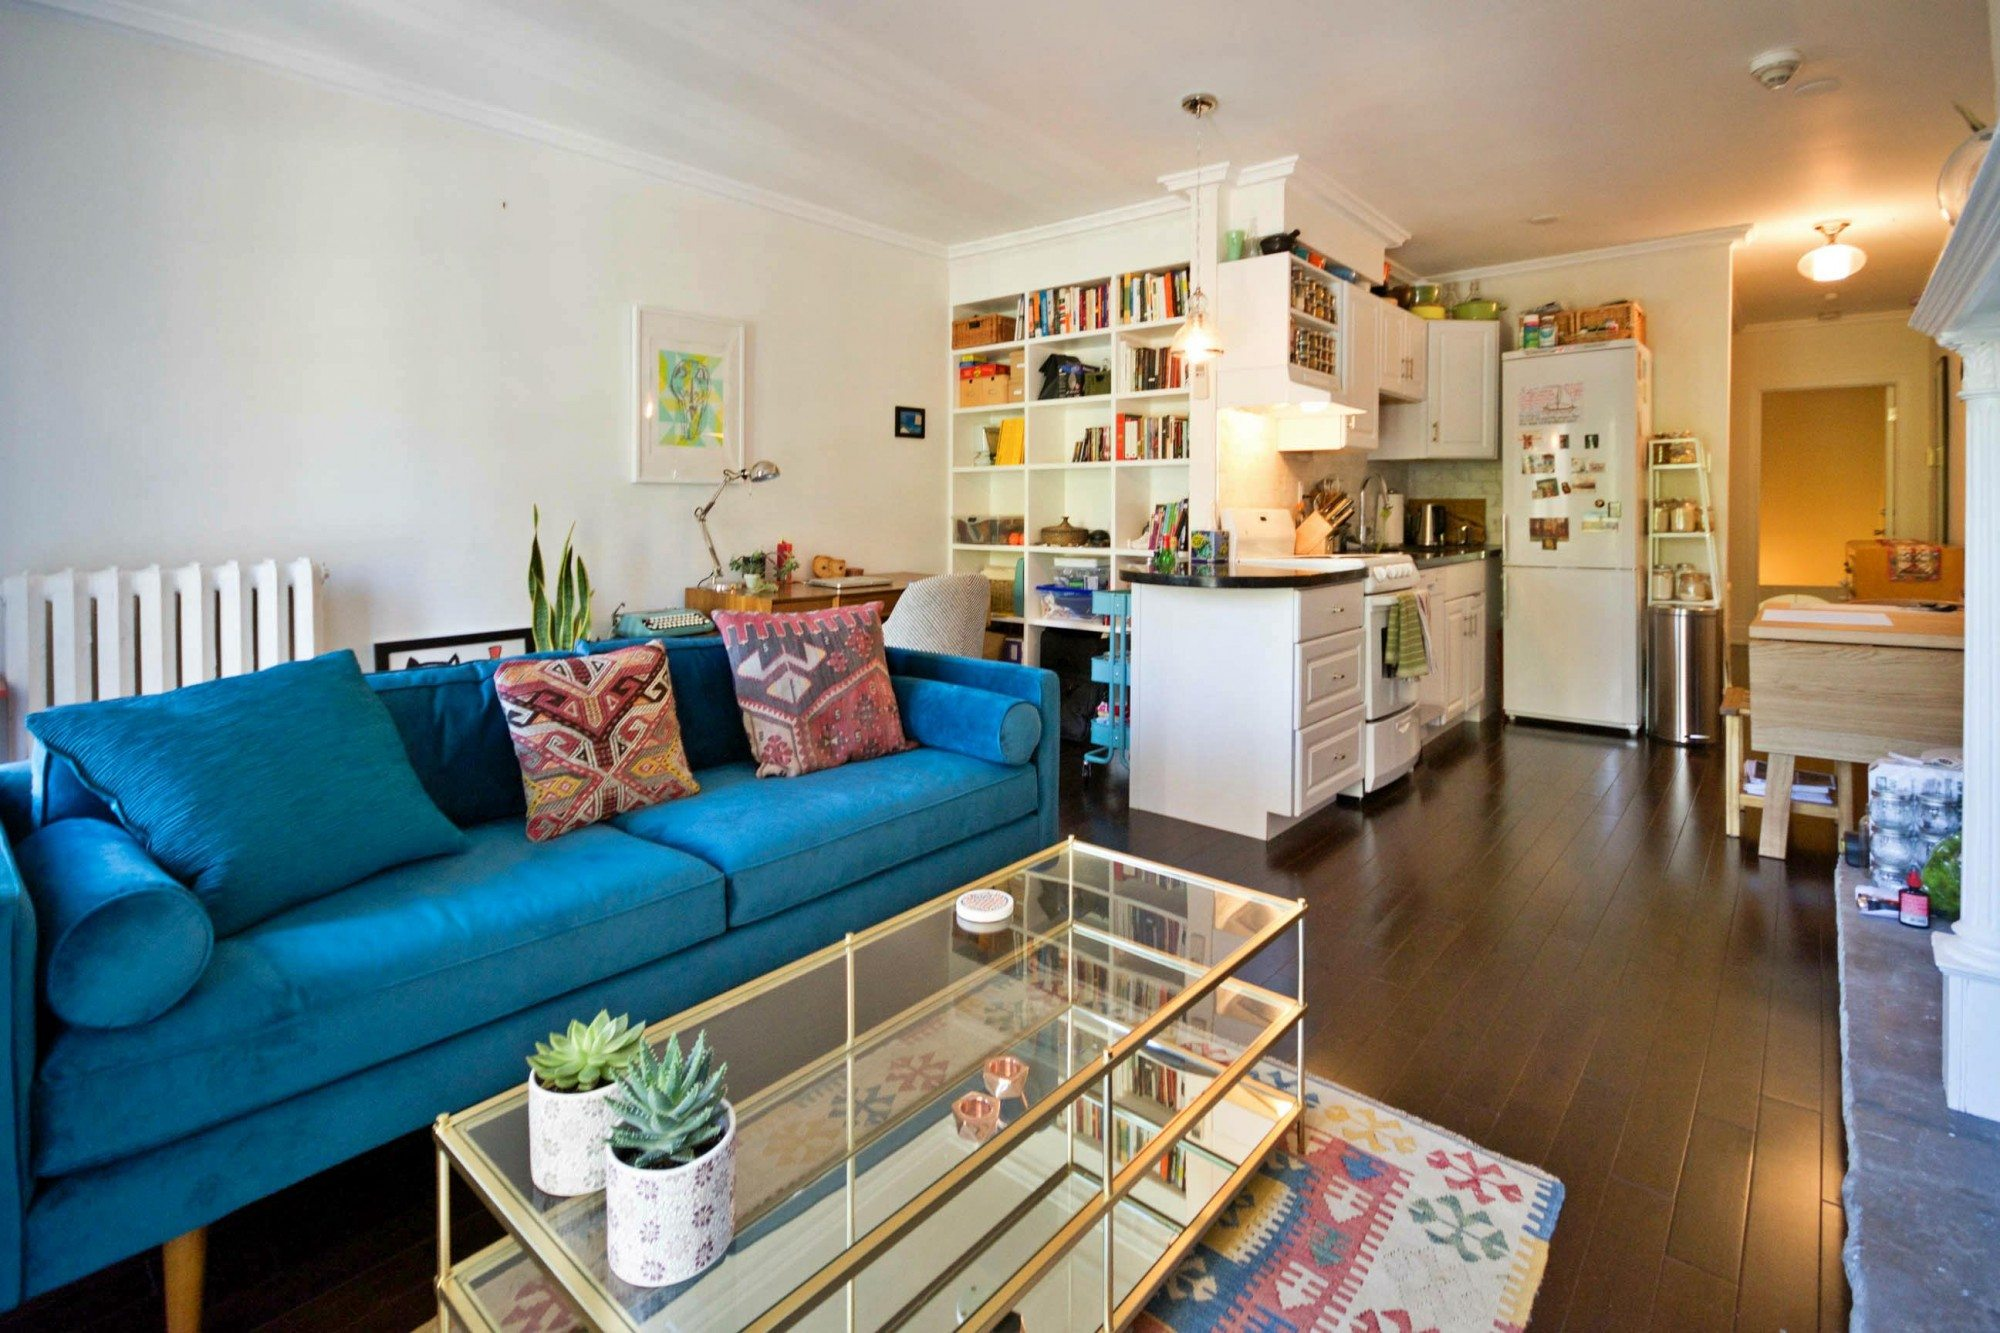 toronto-house-for-sale-81-pembroke-street-11